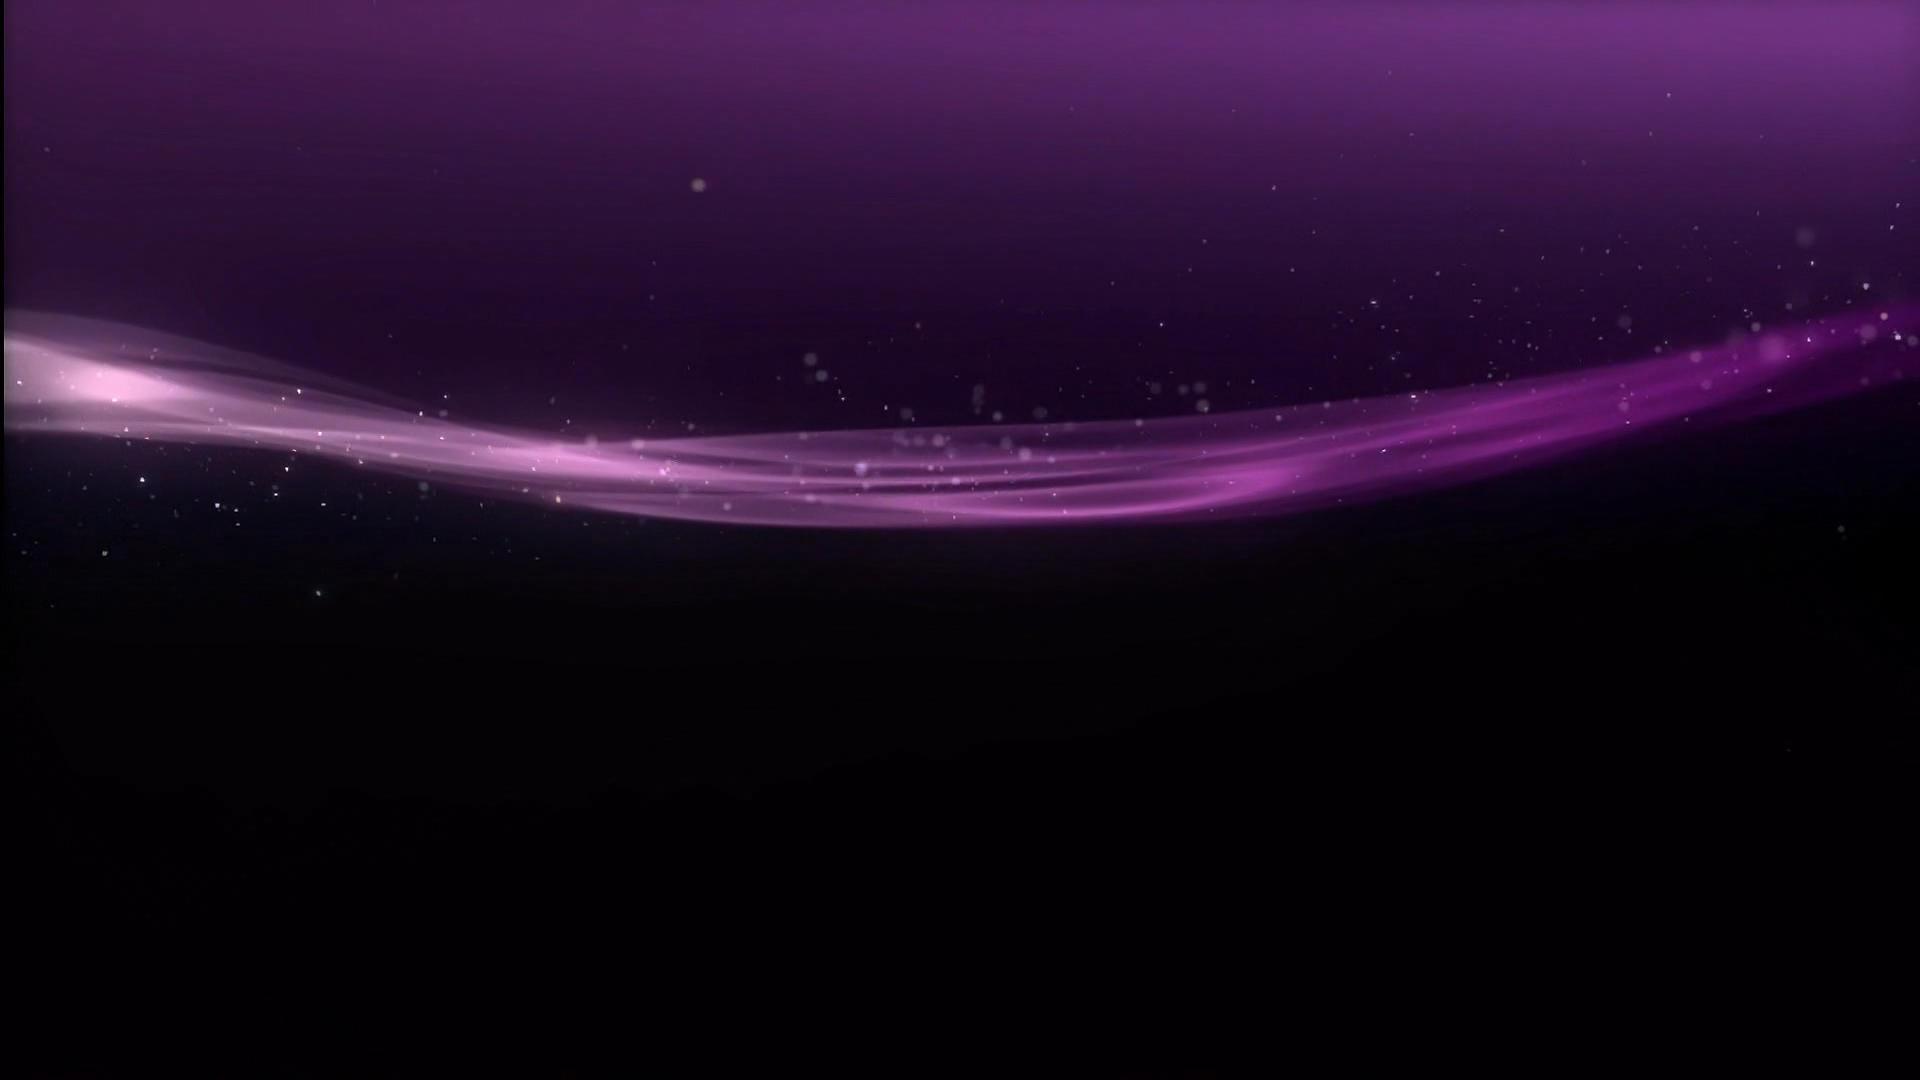 ps3 firmware3.0 lines+sparklesoctogunsalata on deviantart